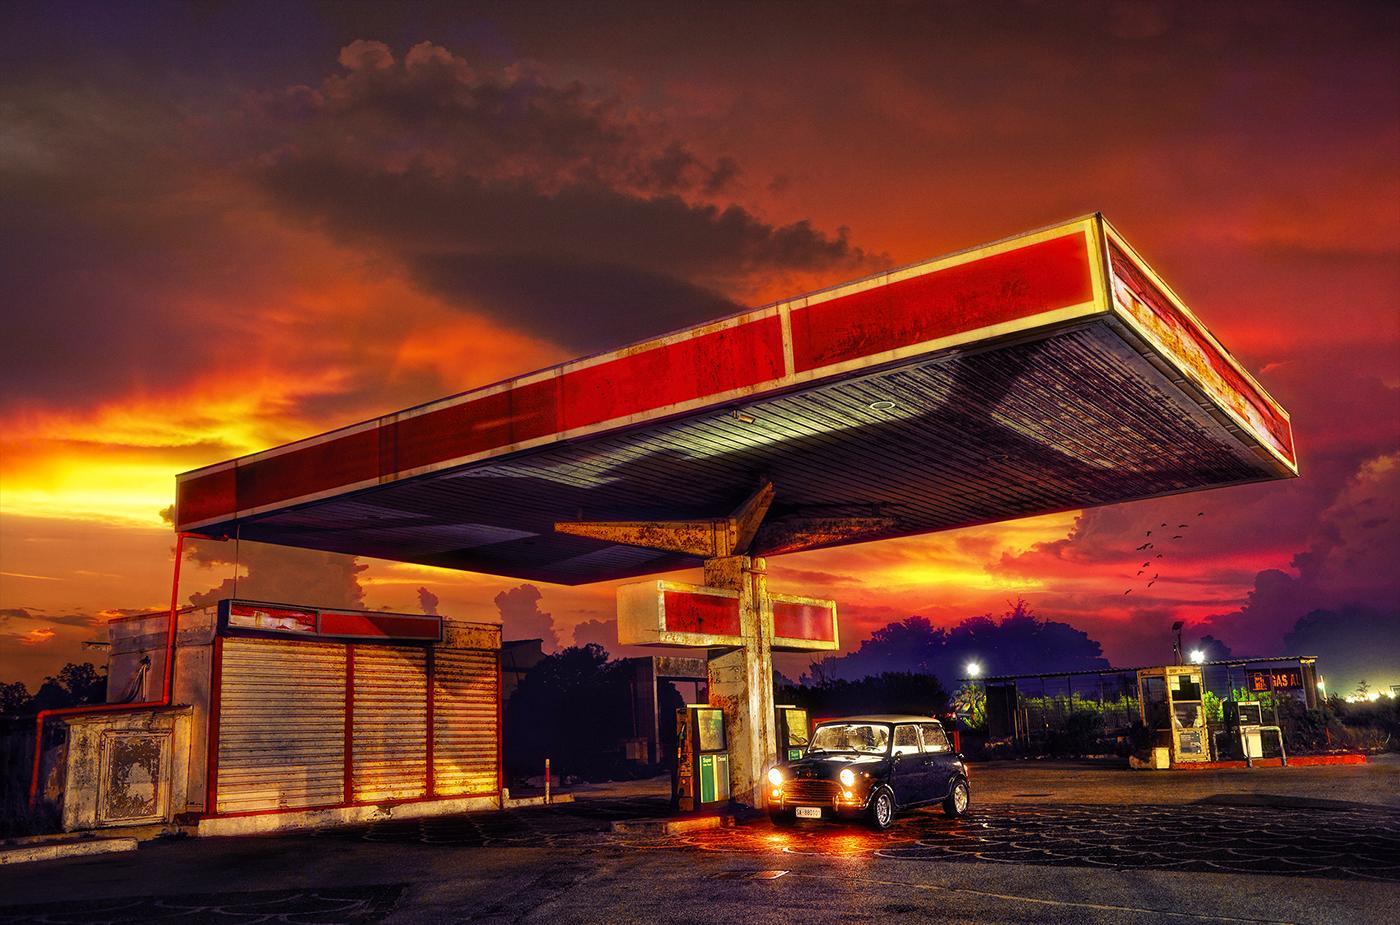 Gasoline Gas Station On Behance